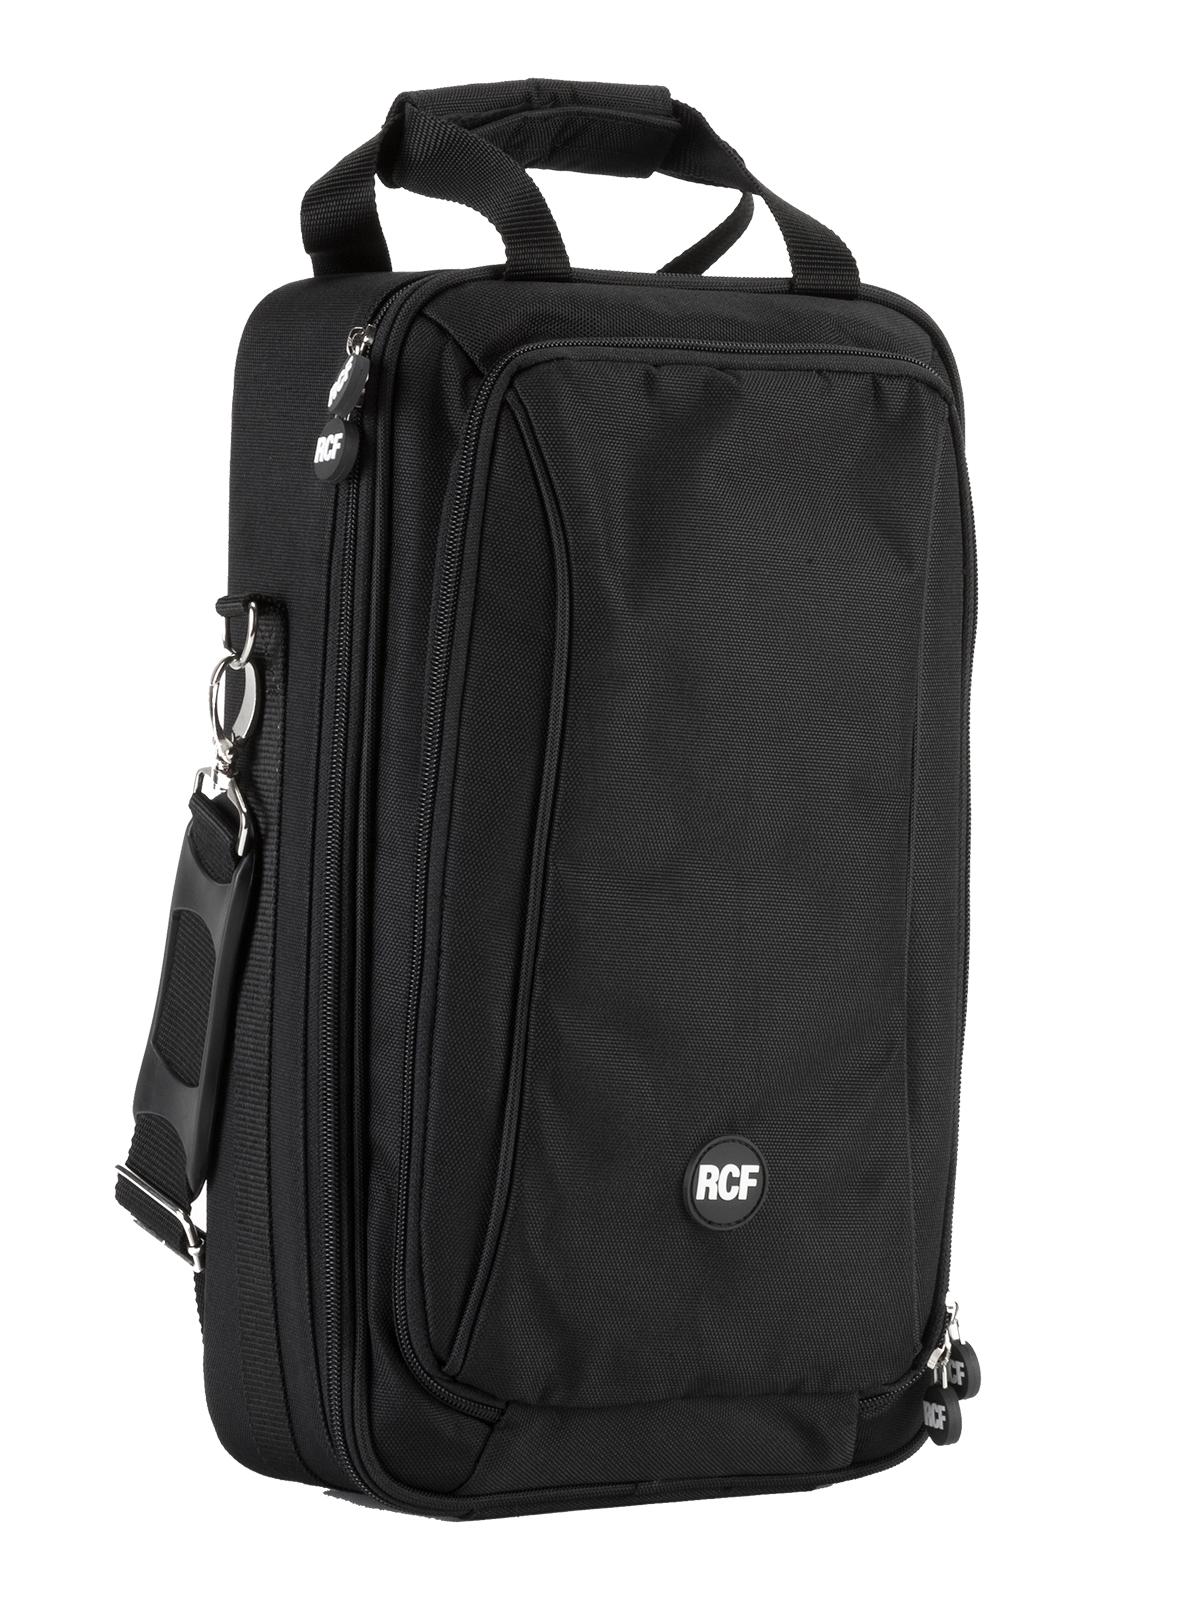 RCF L-PAD BAG 6